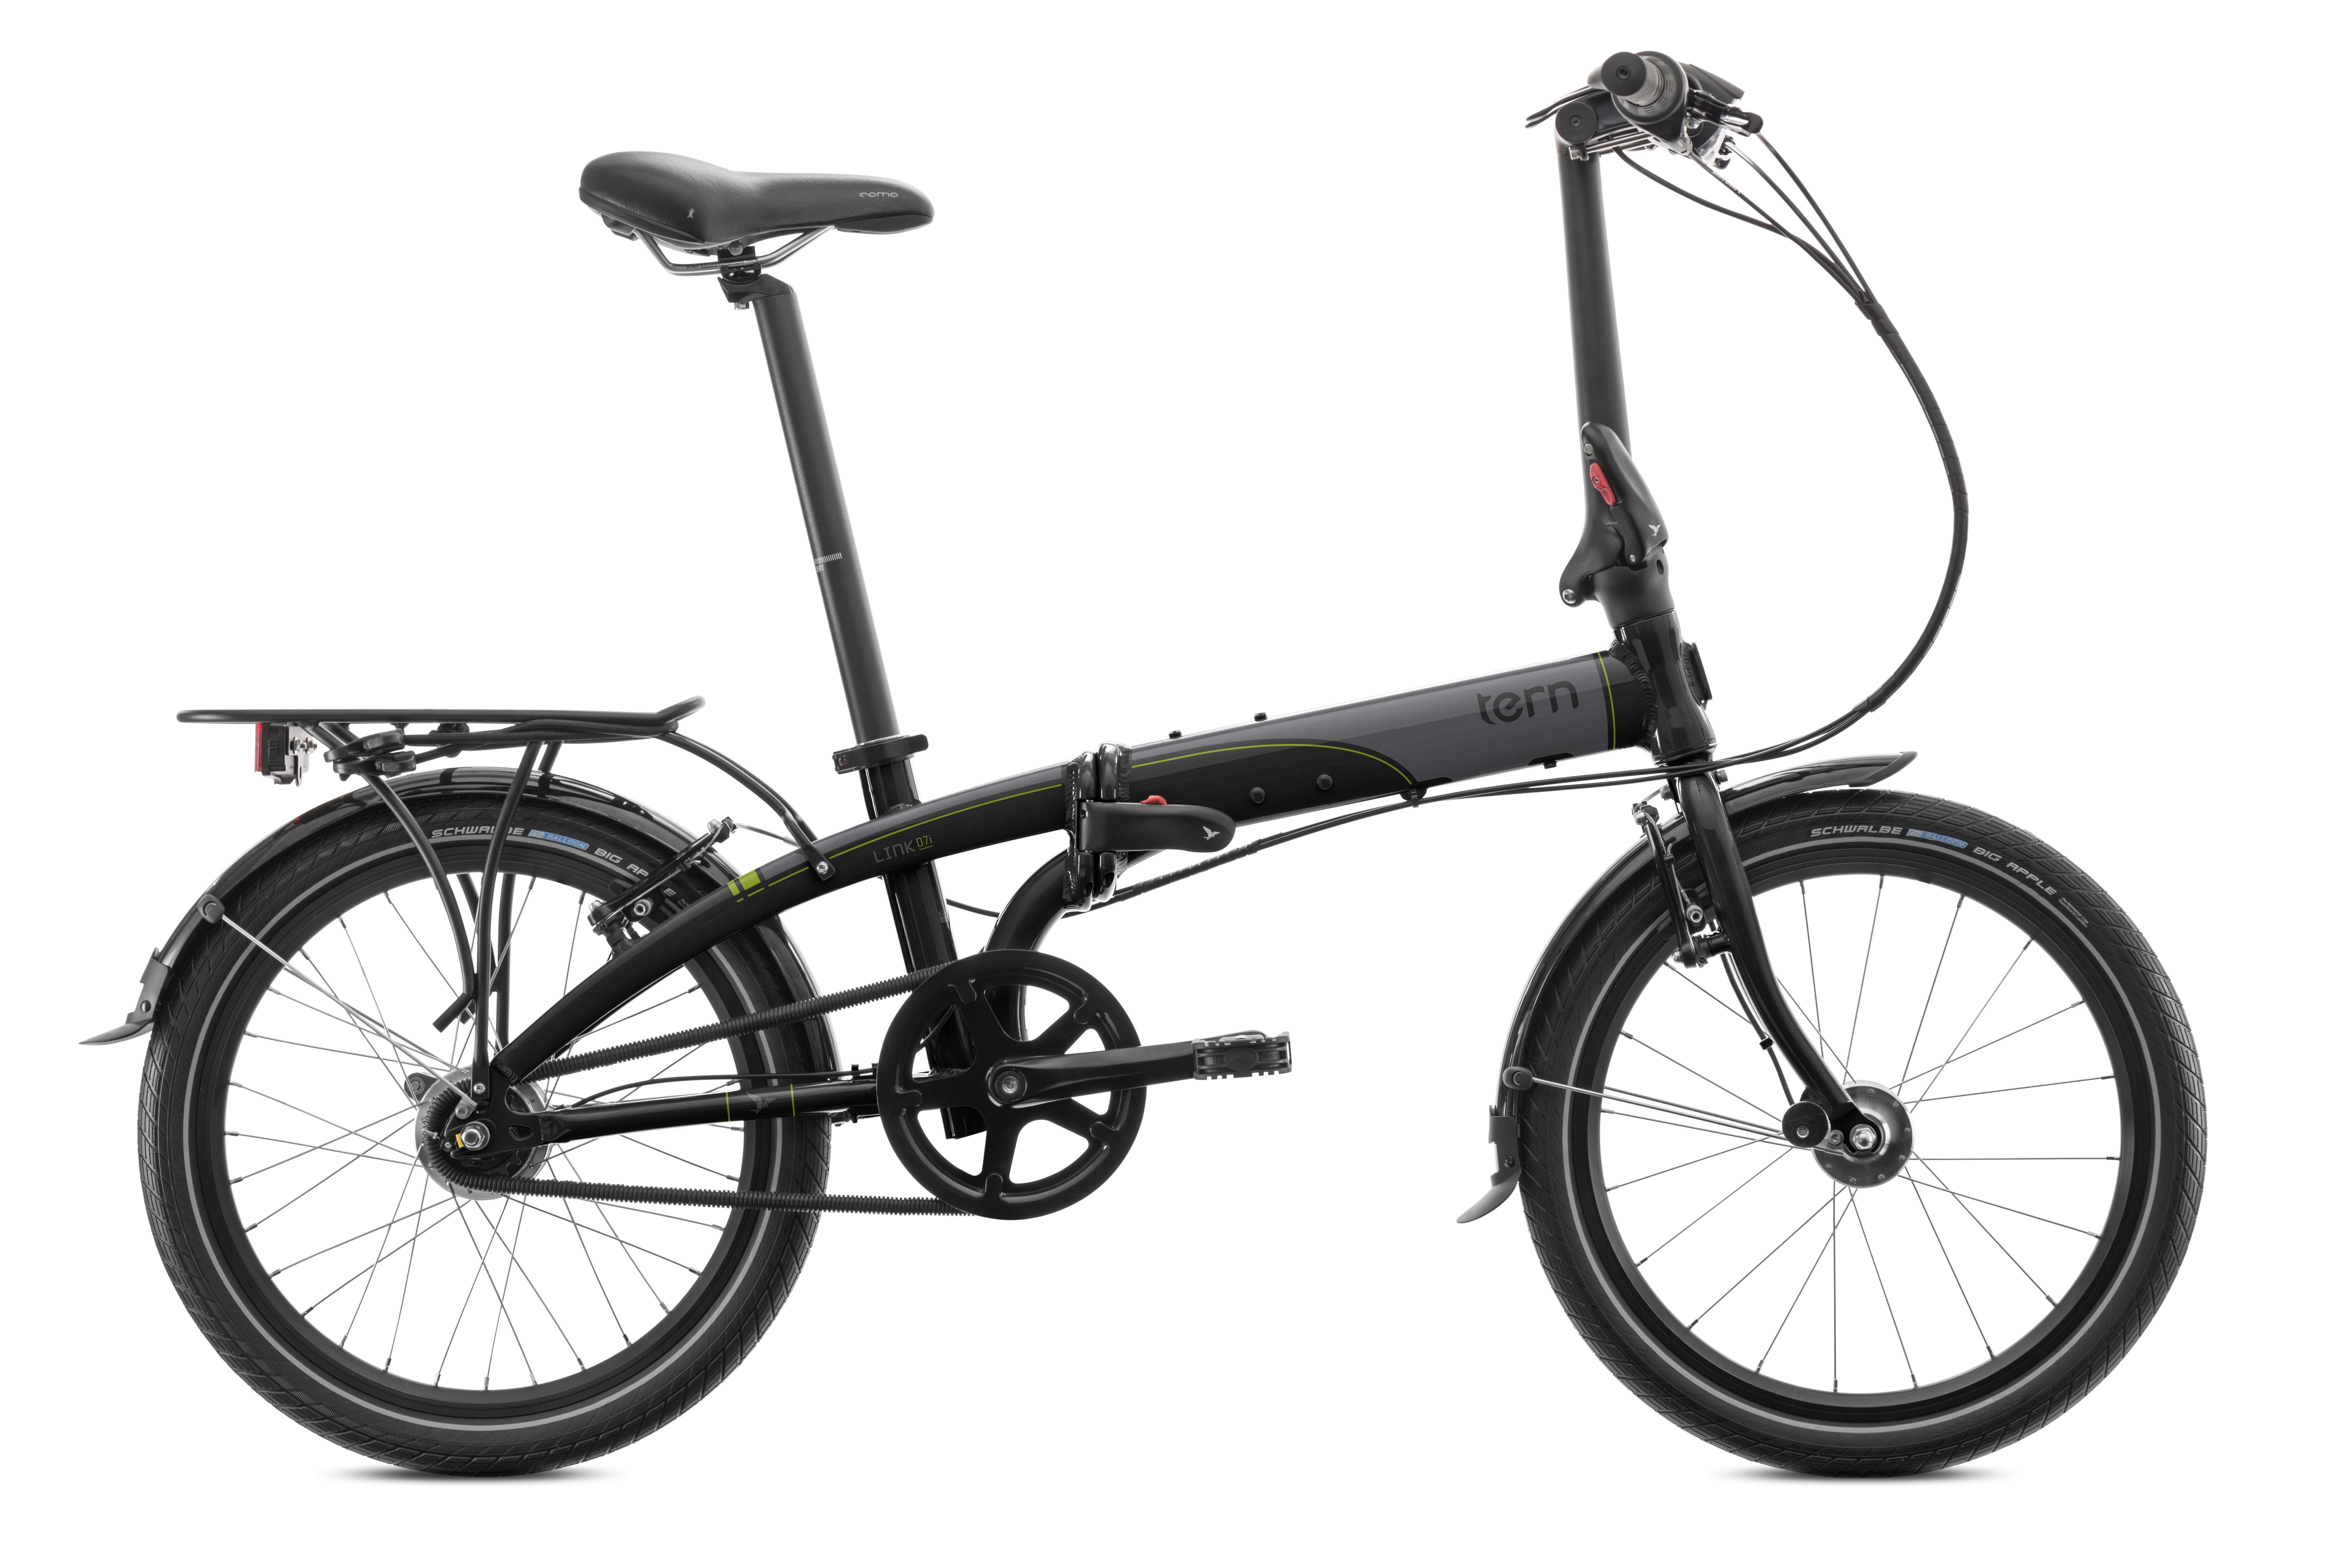 tern link d7i  Link D7i | Tern Folding Bikes | United States